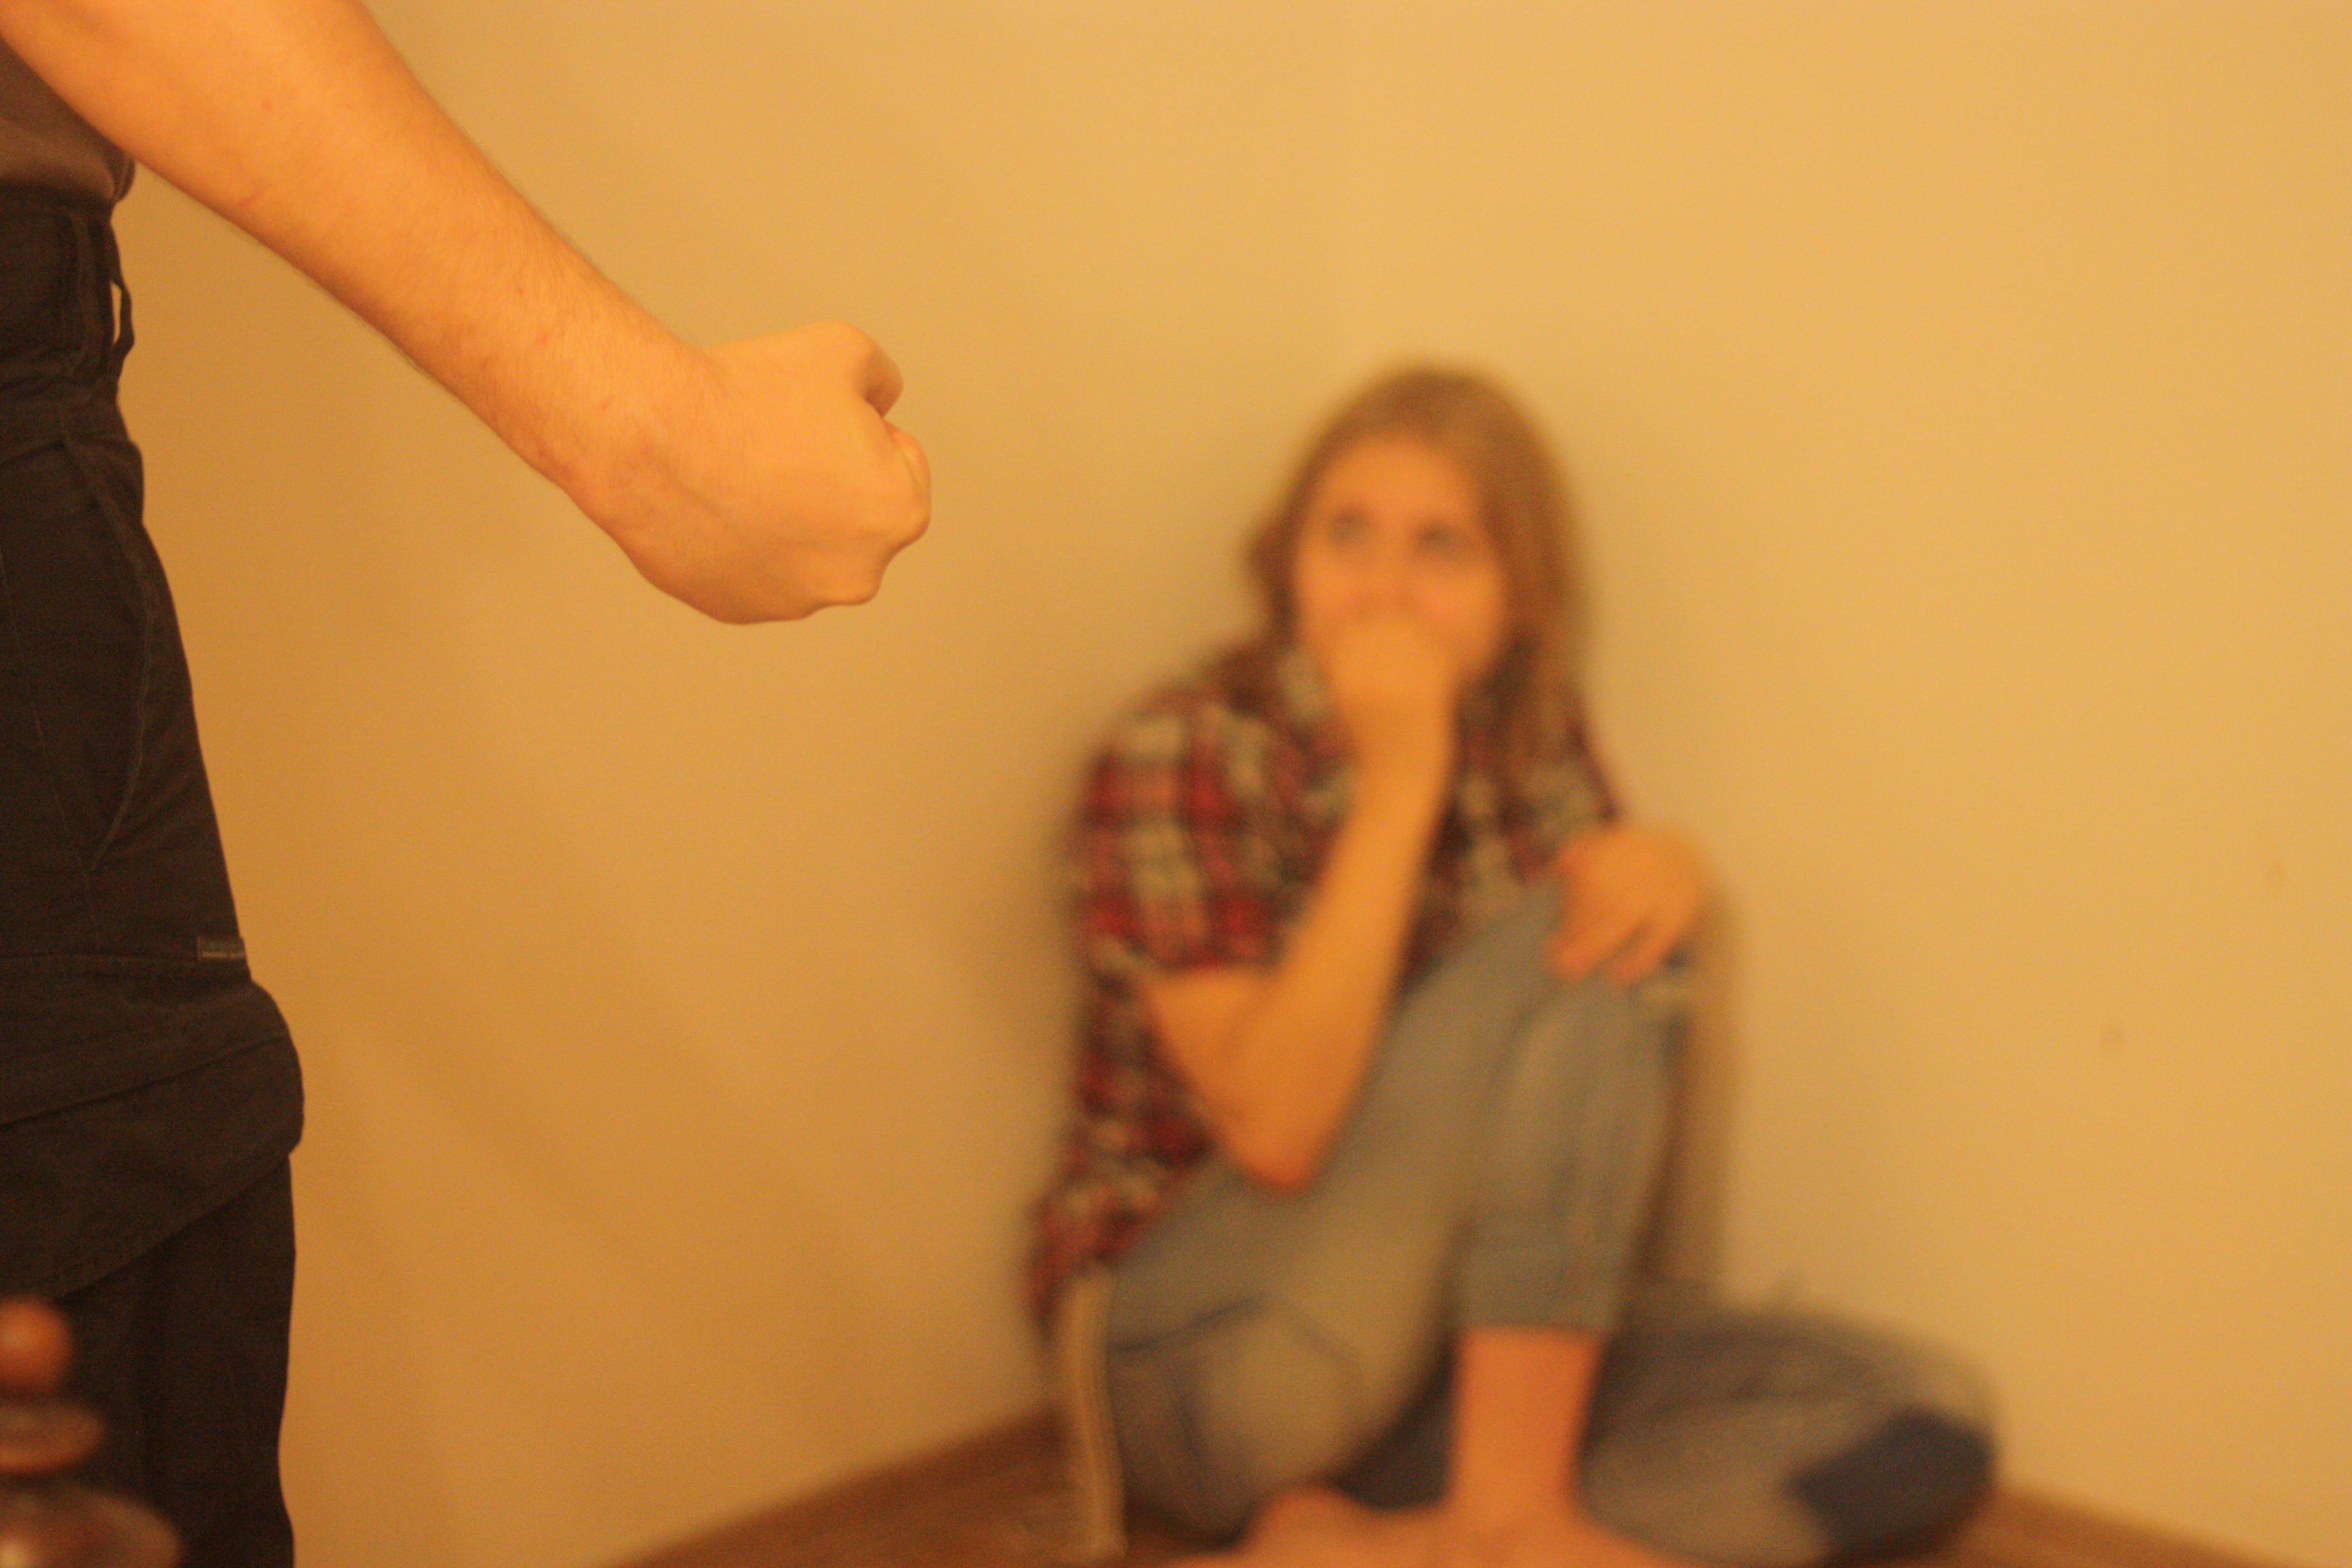 девушка терпит побои во время секса фото наших инцест